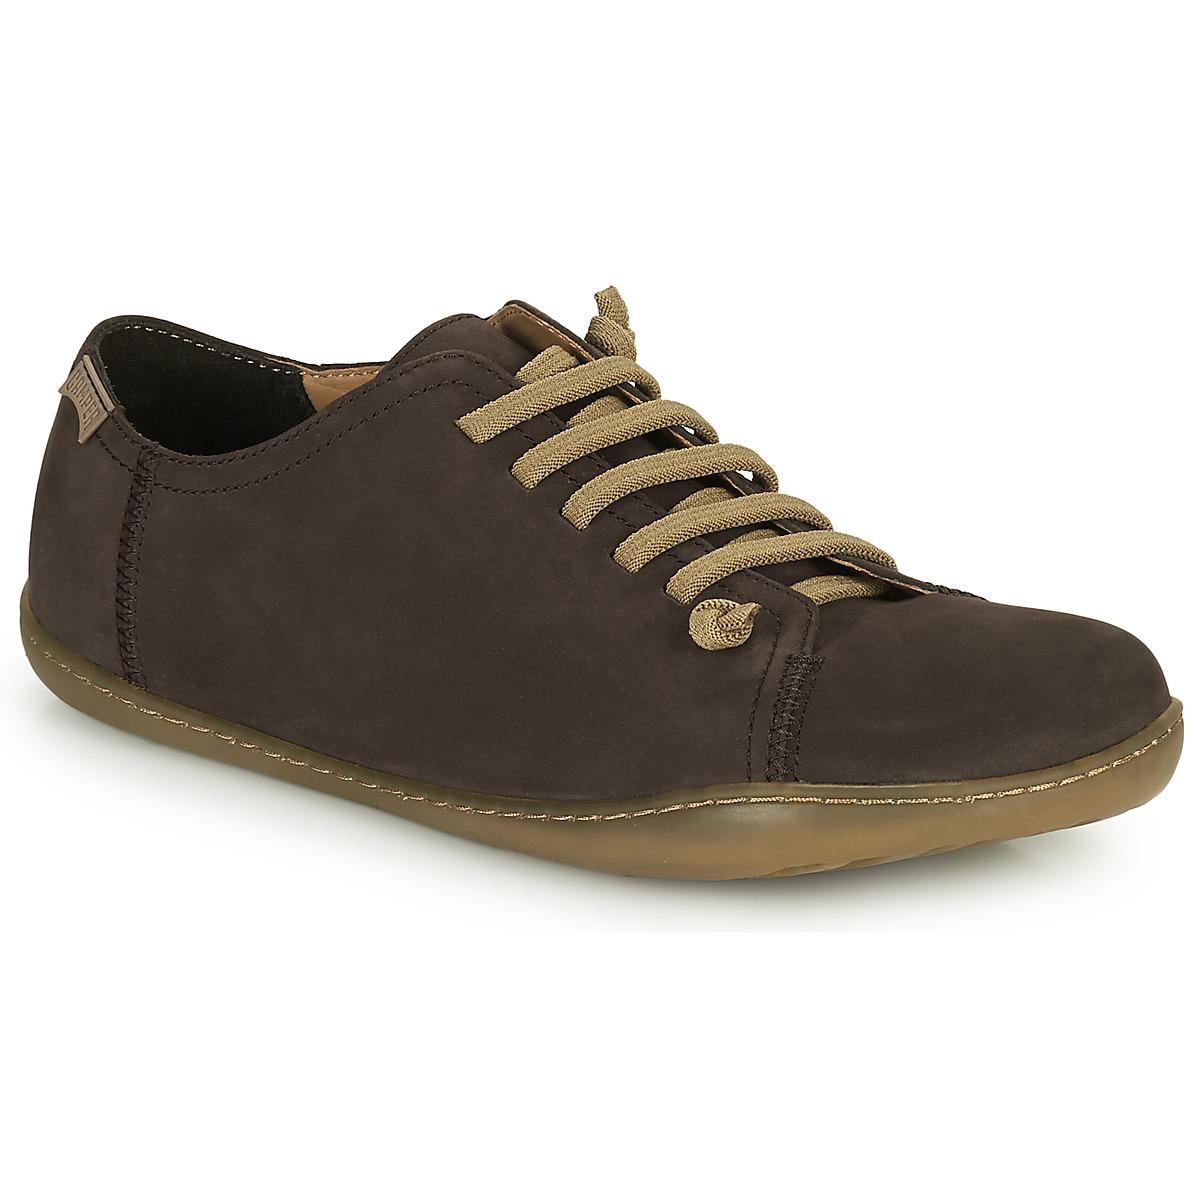 derby camper peu cami marrone consegna gratuita con scarpe uomo 144 00. Black Bedroom Furniture Sets. Home Design Ideas